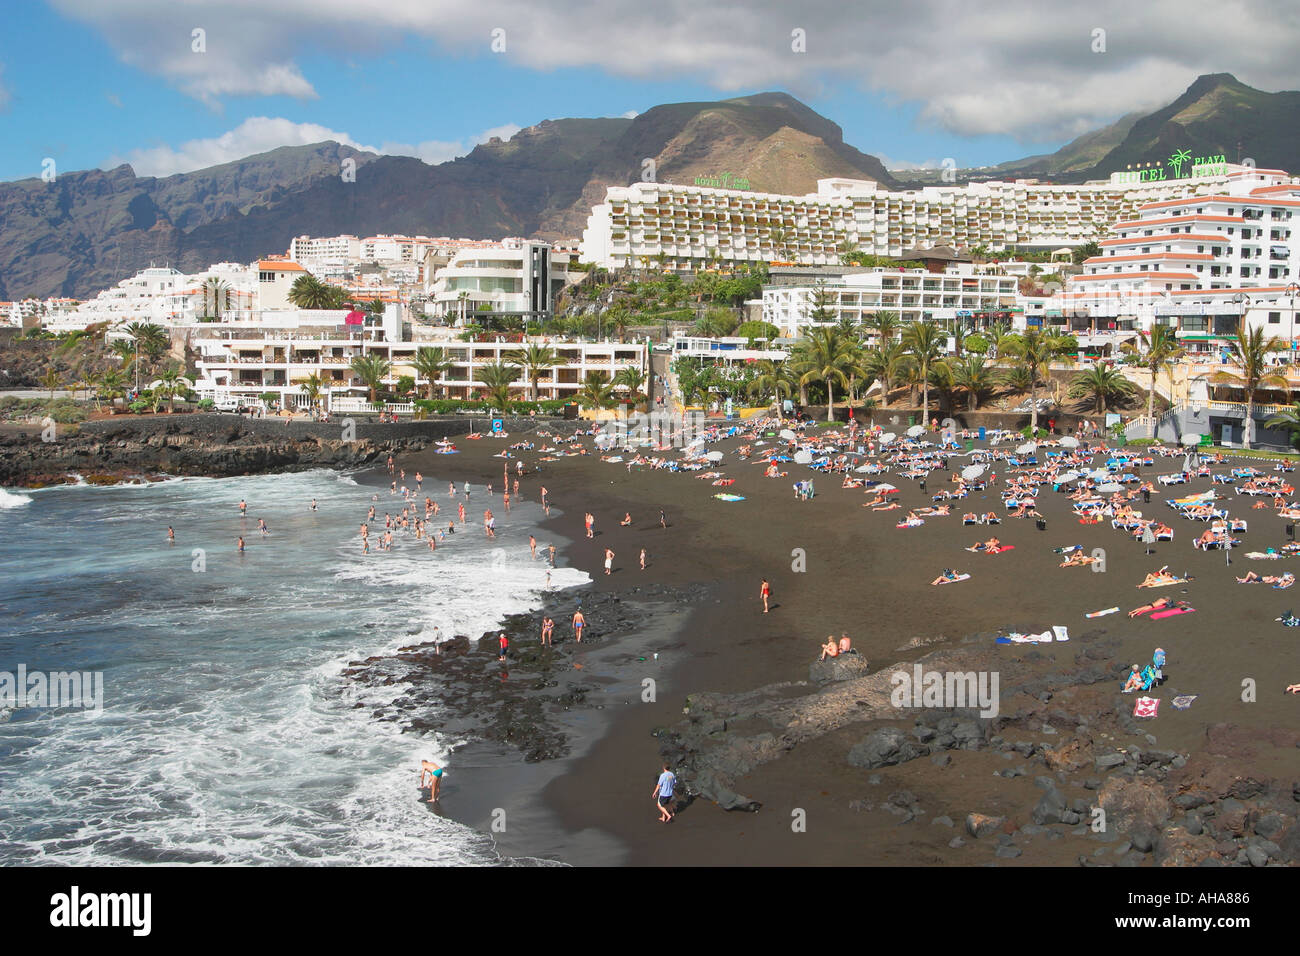 Playa de la arena puerto de santiago tenerife canary islands spain stock photo 1157253 alamy - Puerto santiago tenerife mapa ...